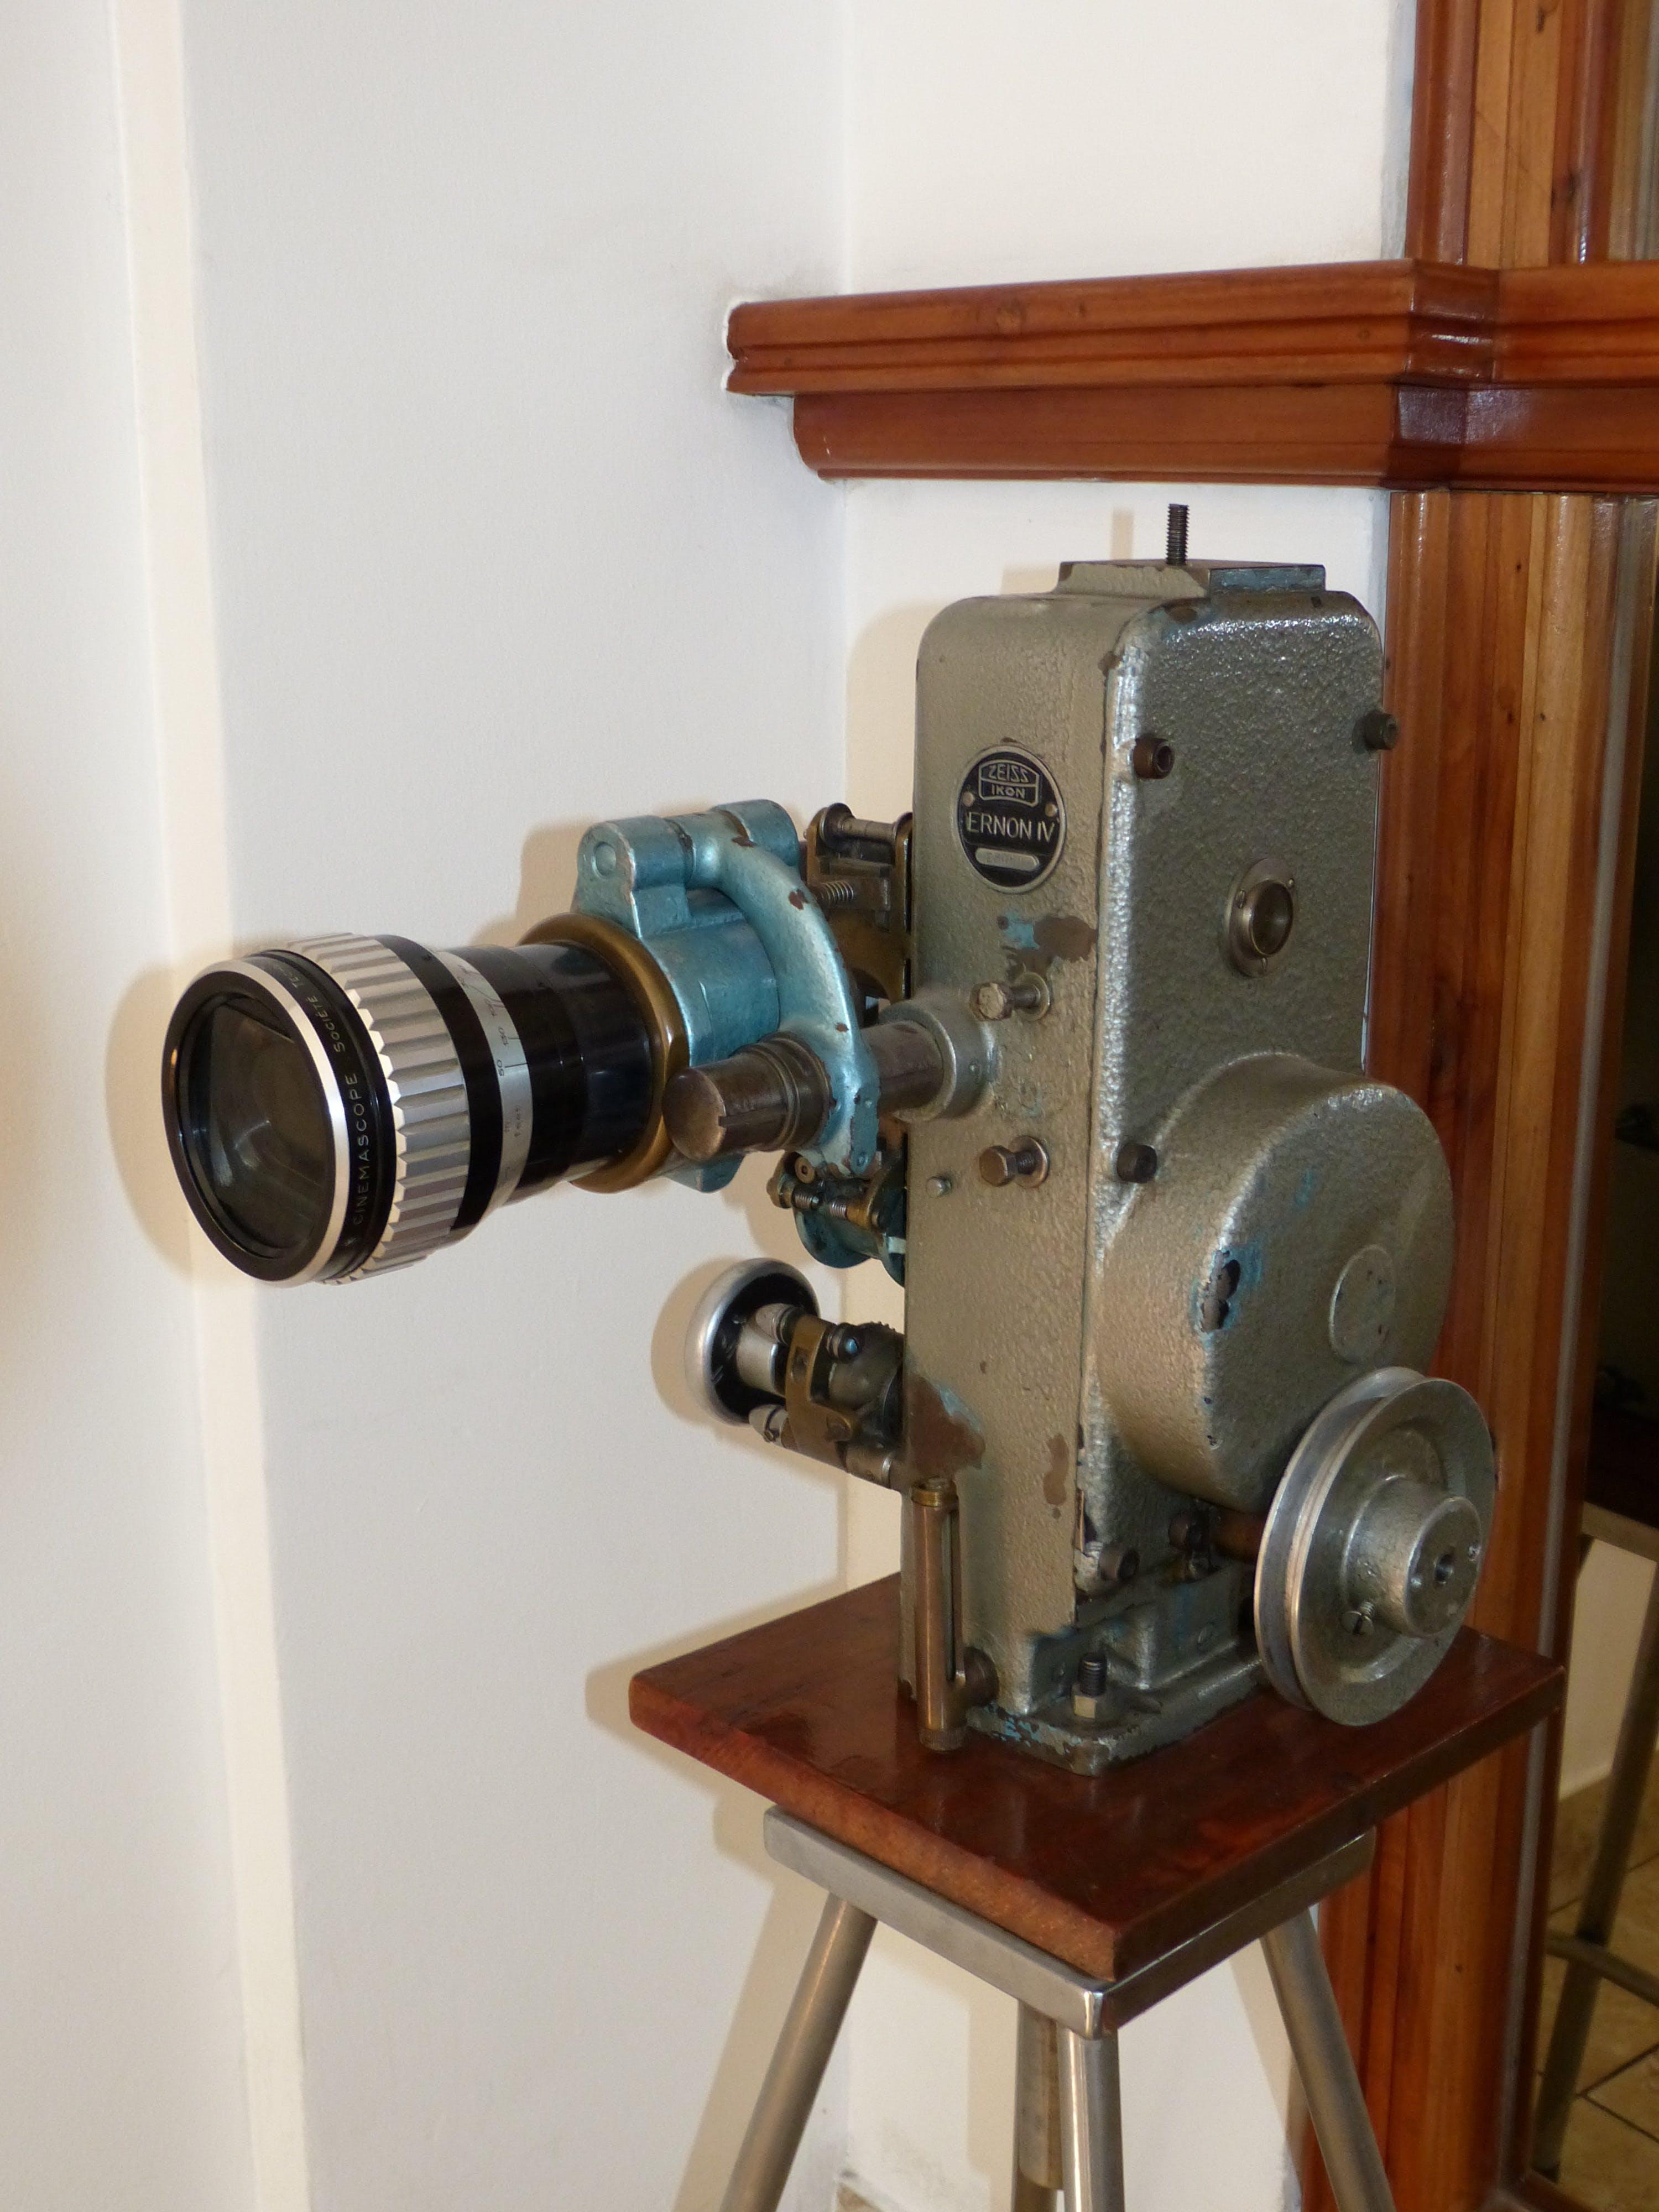 Free stock photo of camera, technology, lens, film